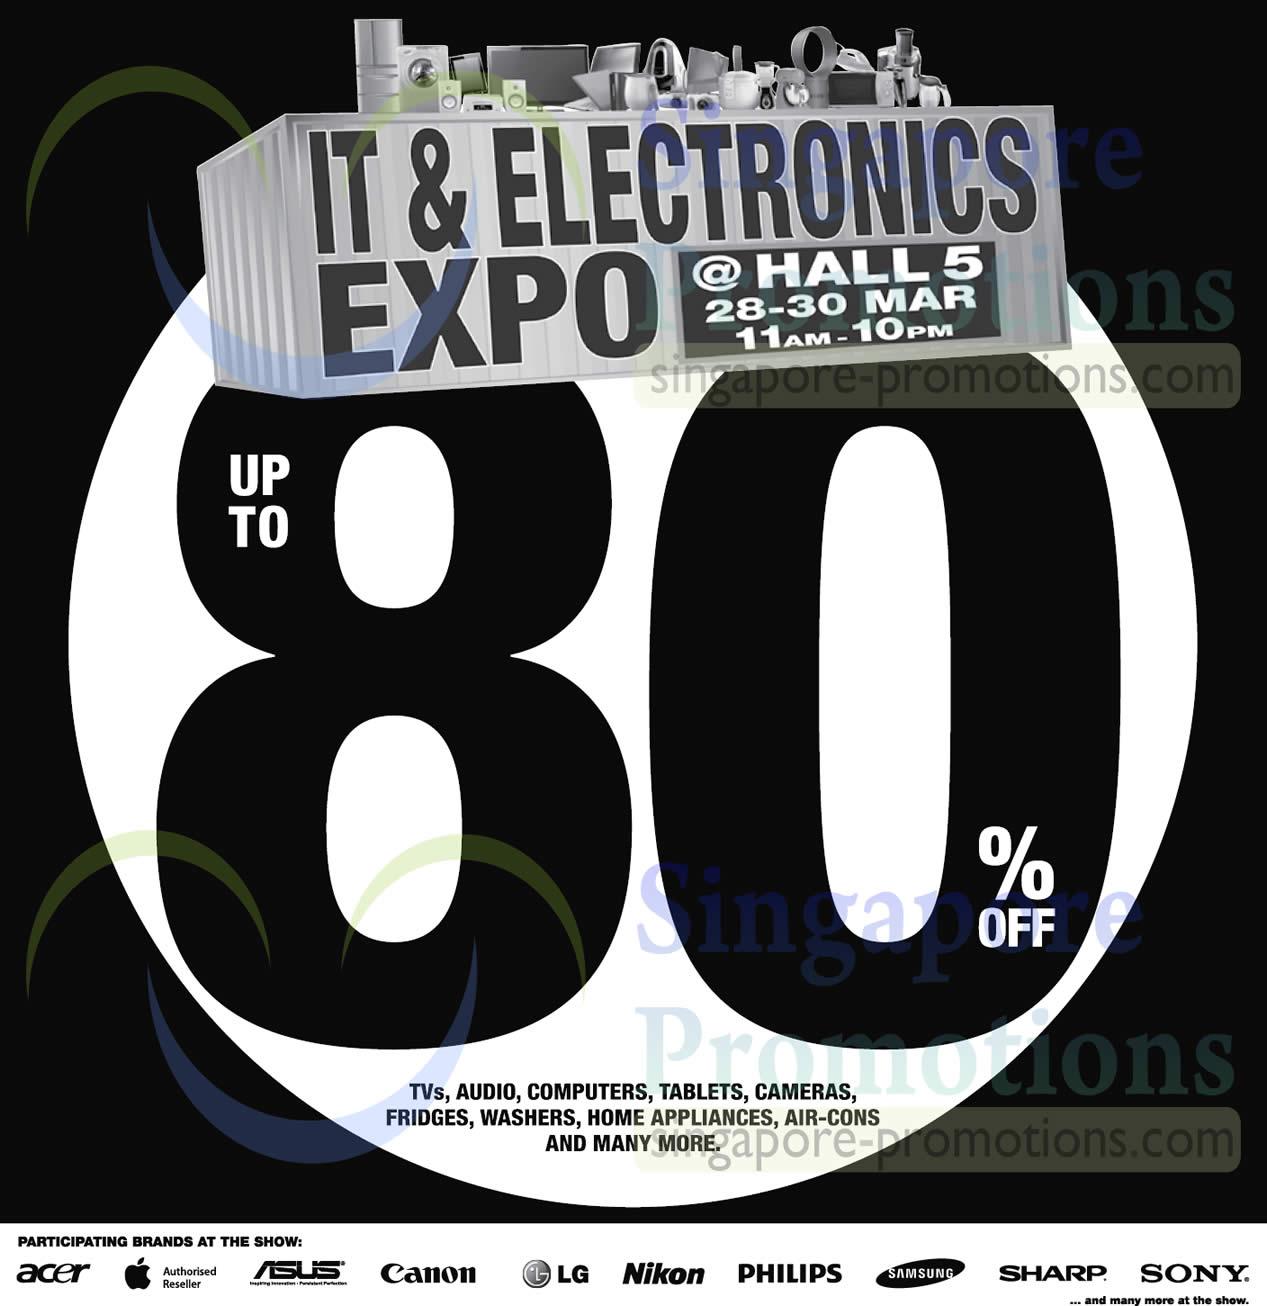 28 Mar Participating Brands, Event Info